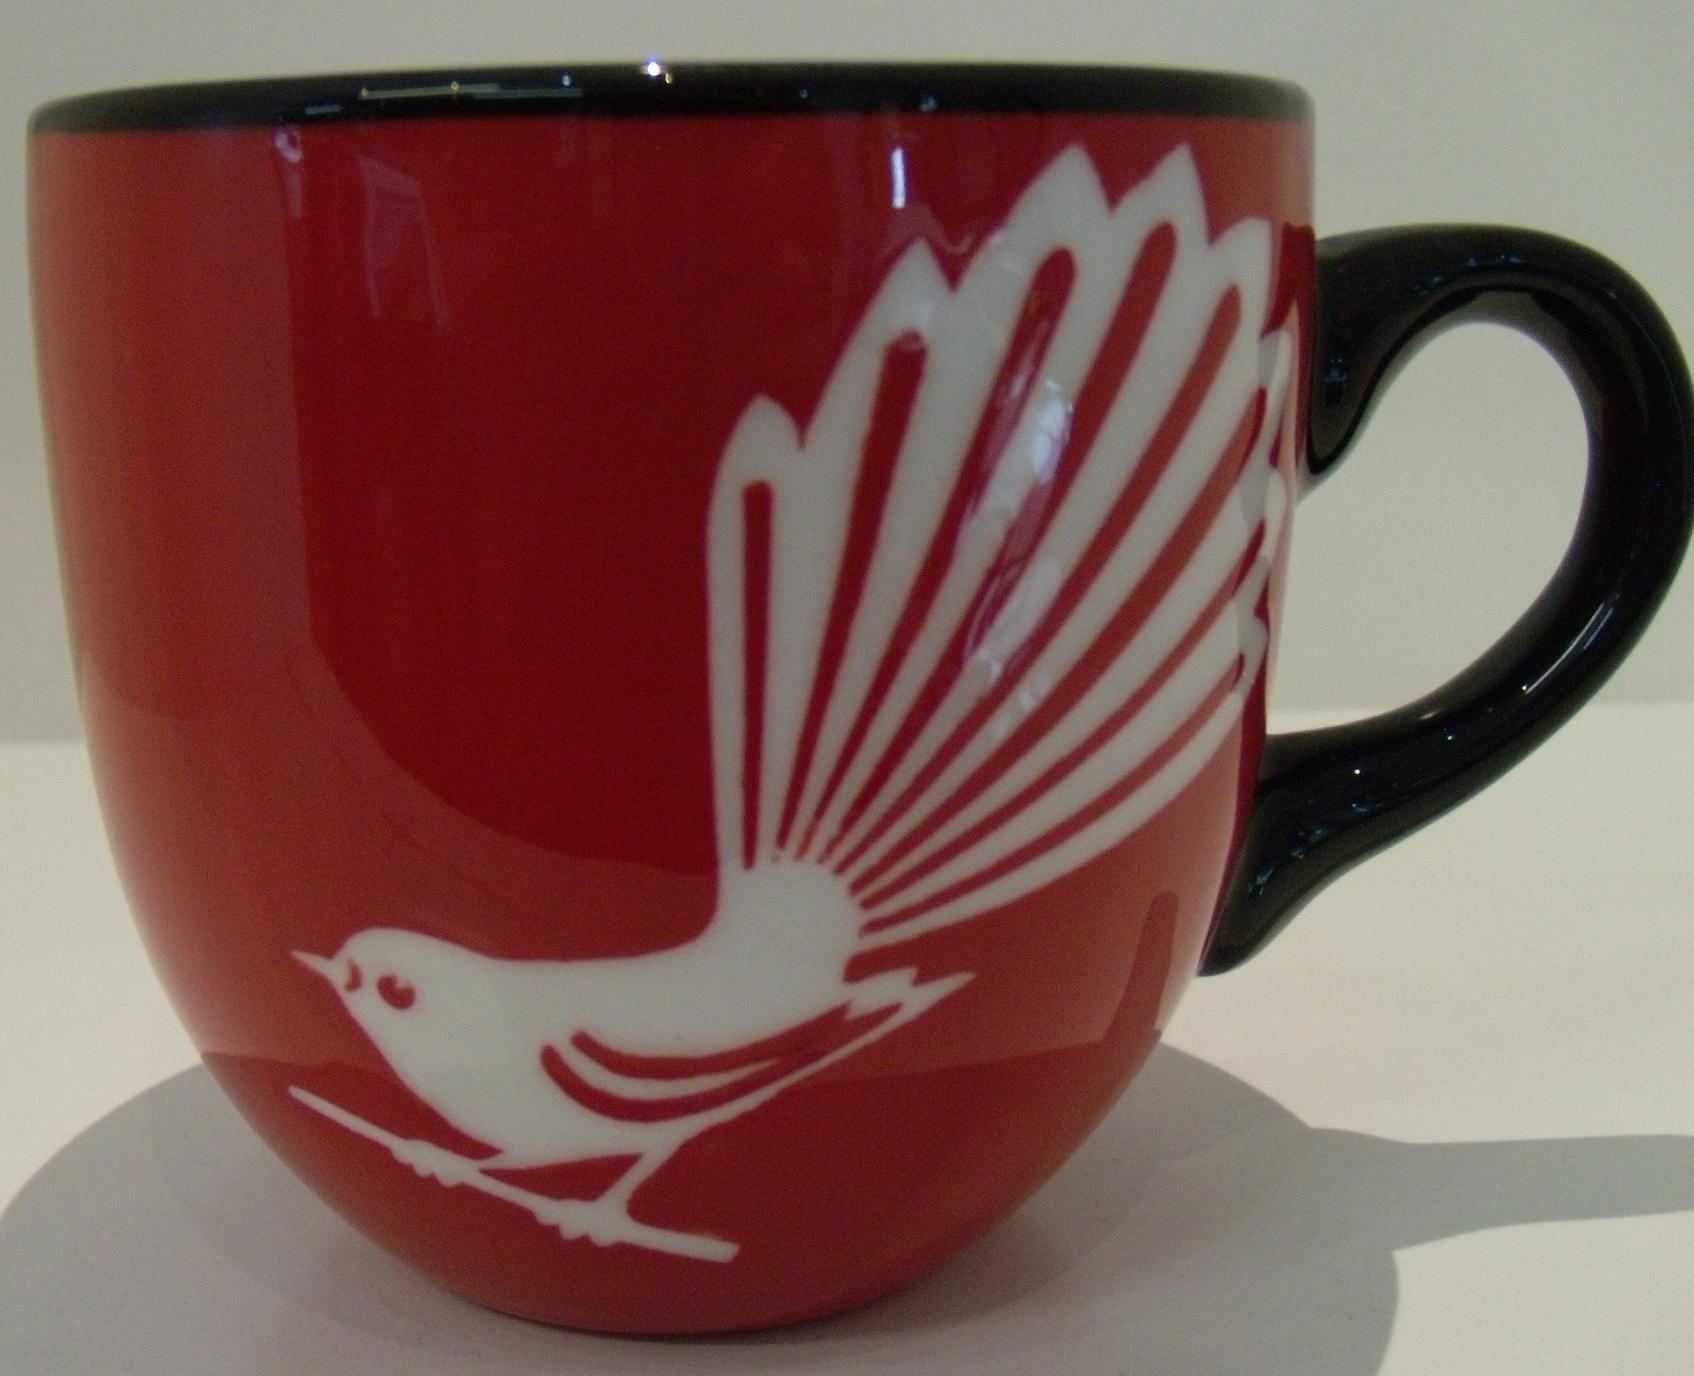 Fantail Mug $35 Diameter 95mm x 90mm h